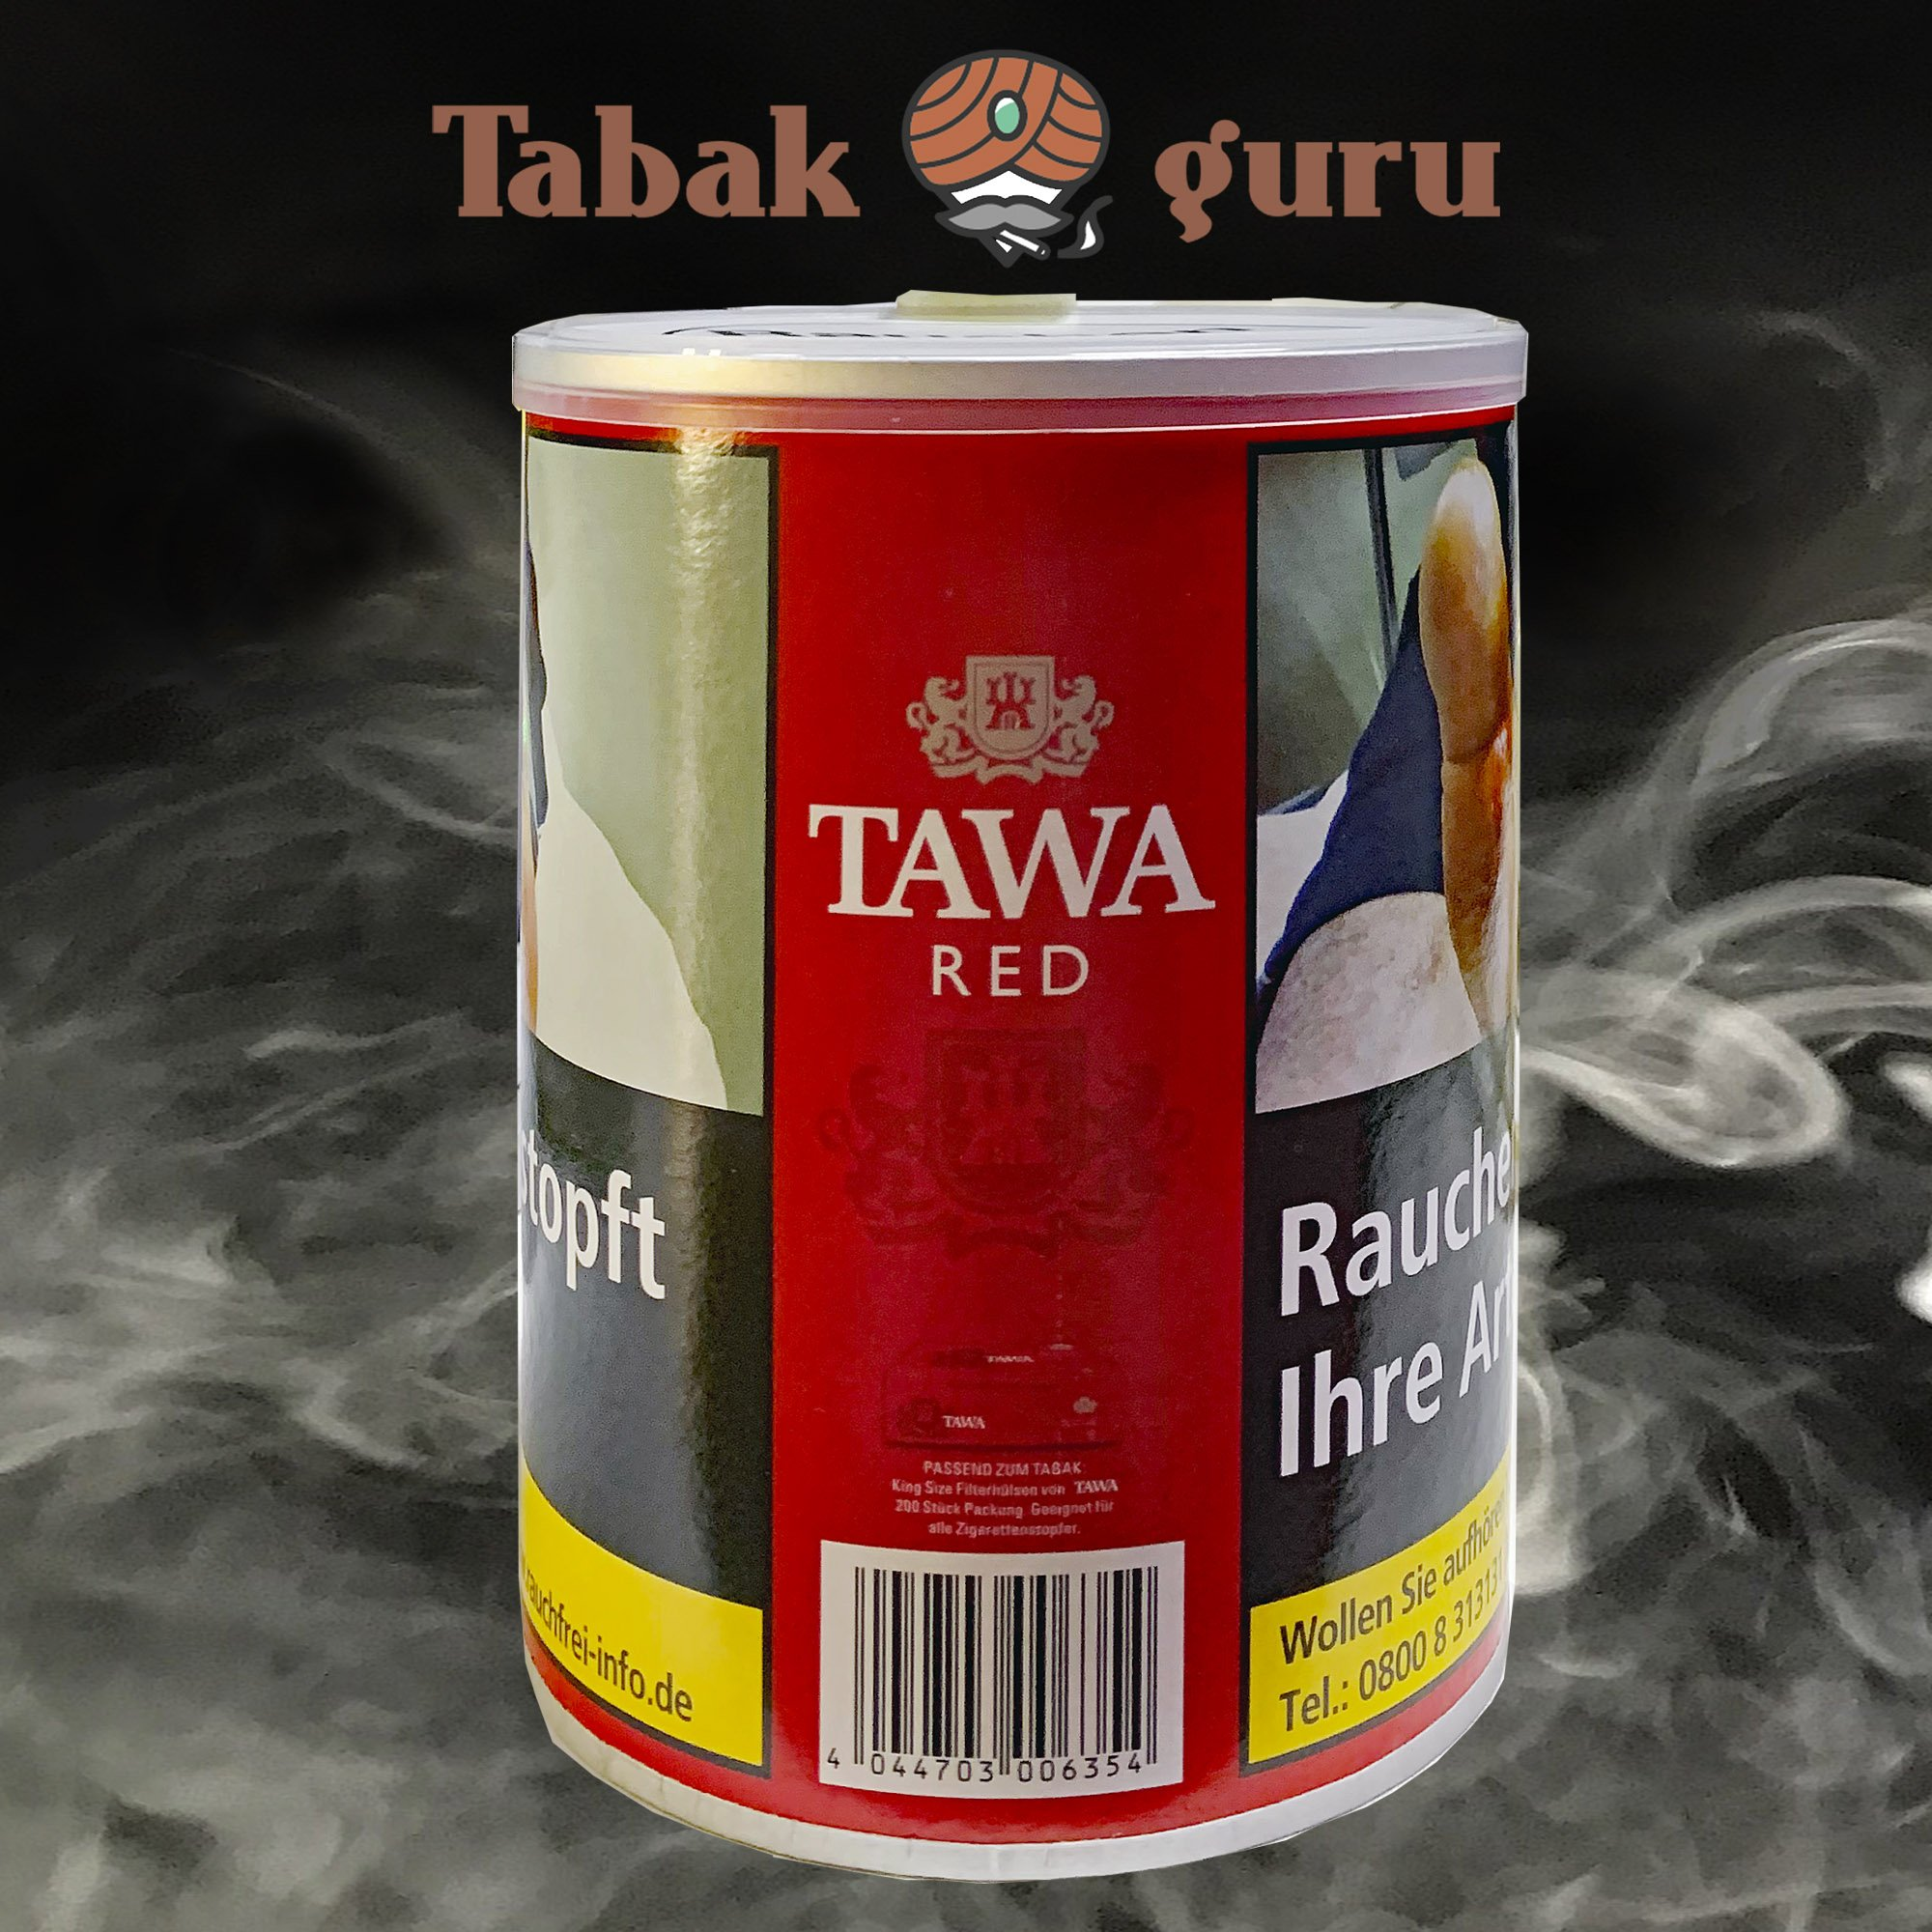 Tawa Red American Blend Zigarettentabak 140g Dose